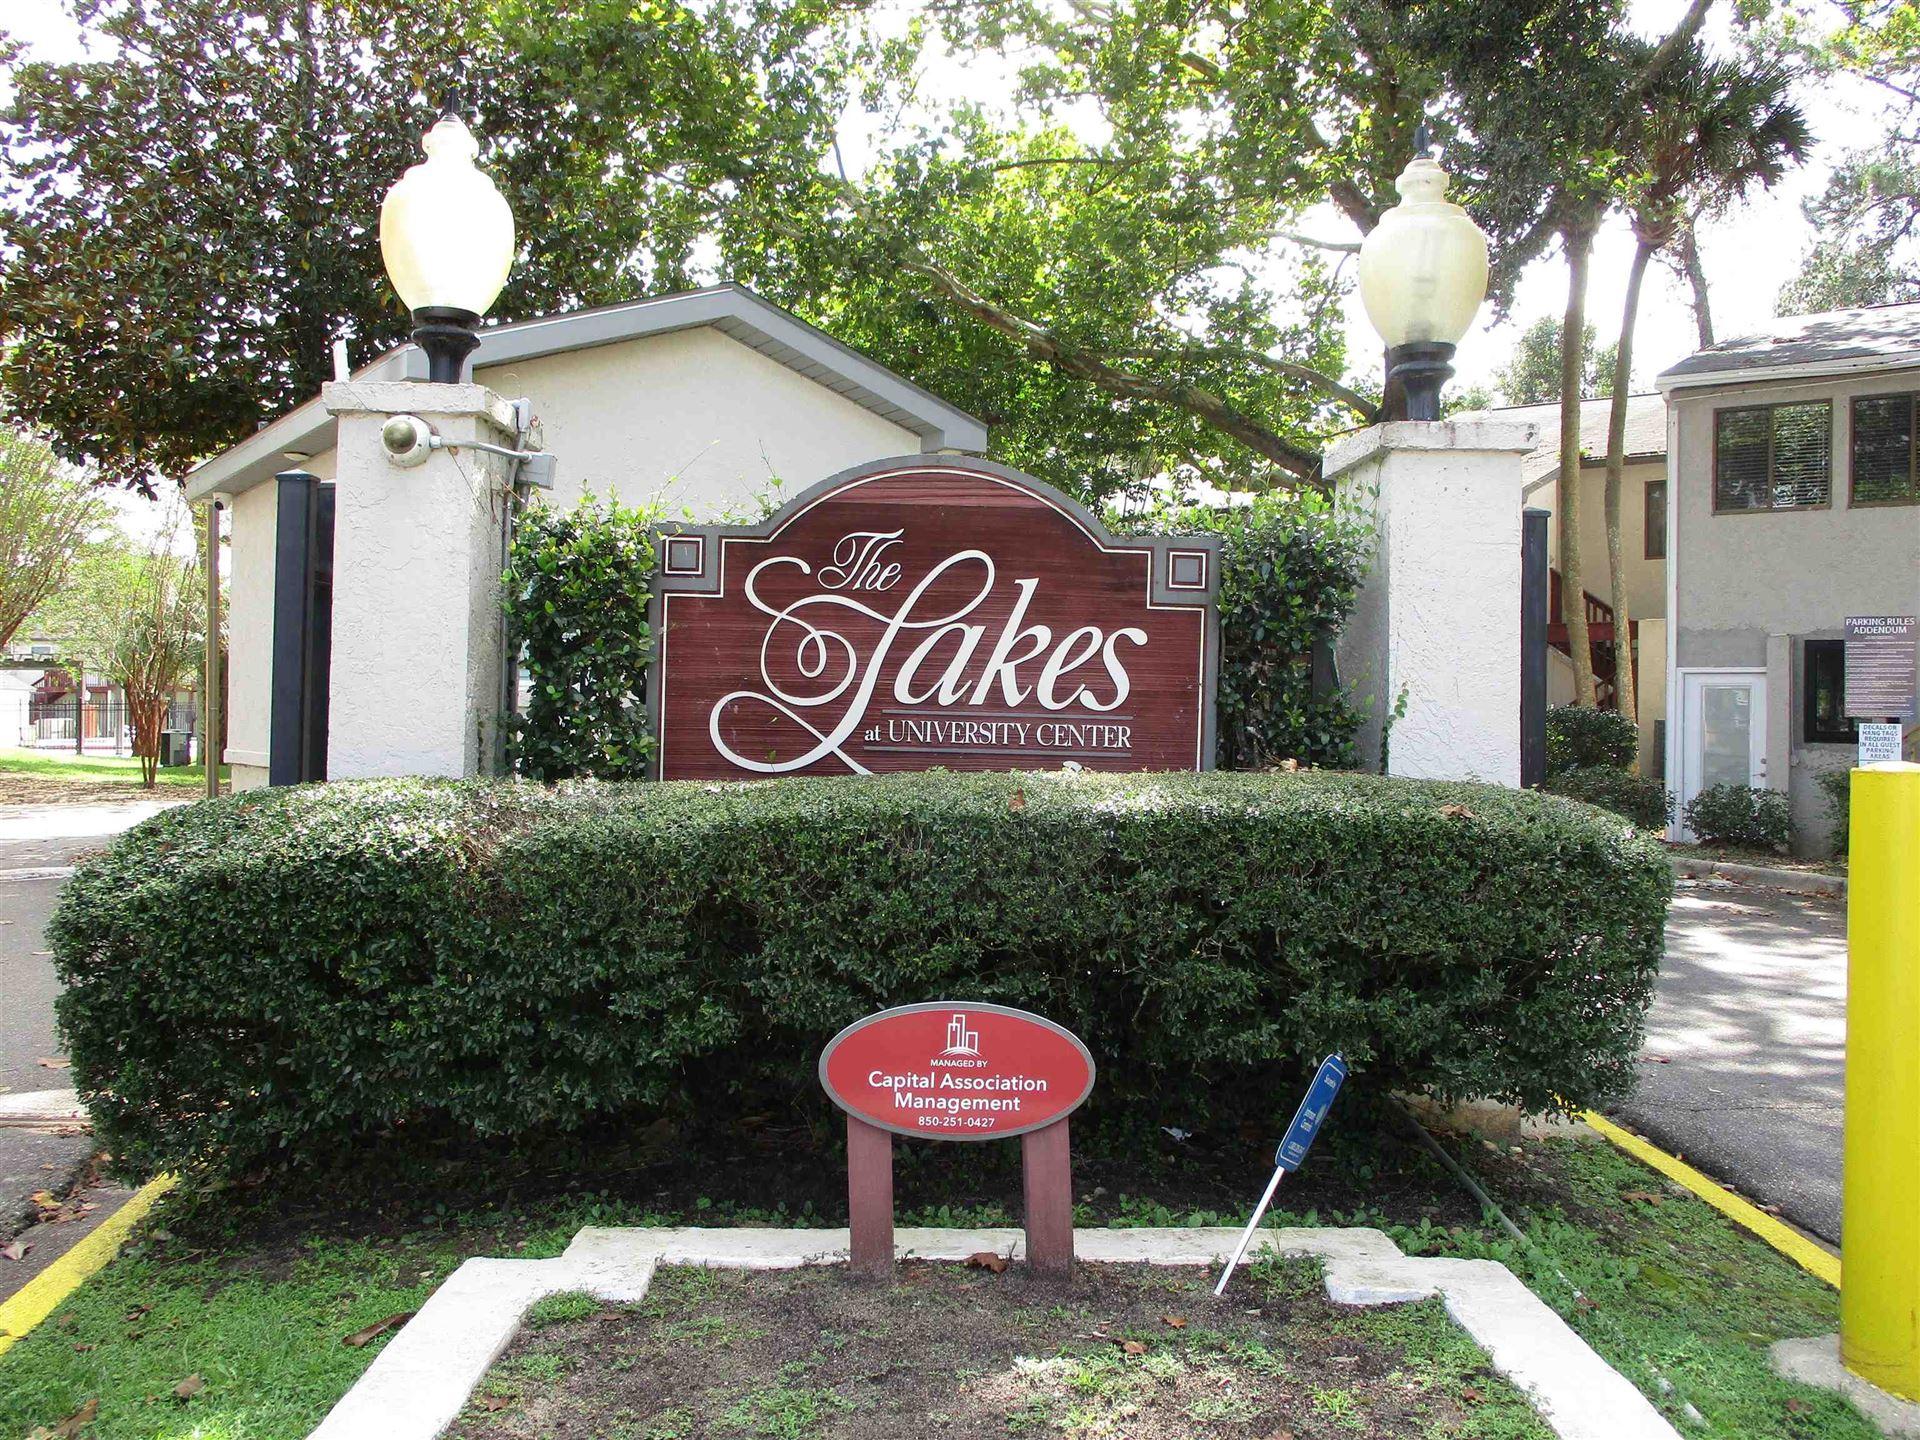 1309 Airport Dr #C 7, Tallahassee, FL 32304 - MLS#: 338246